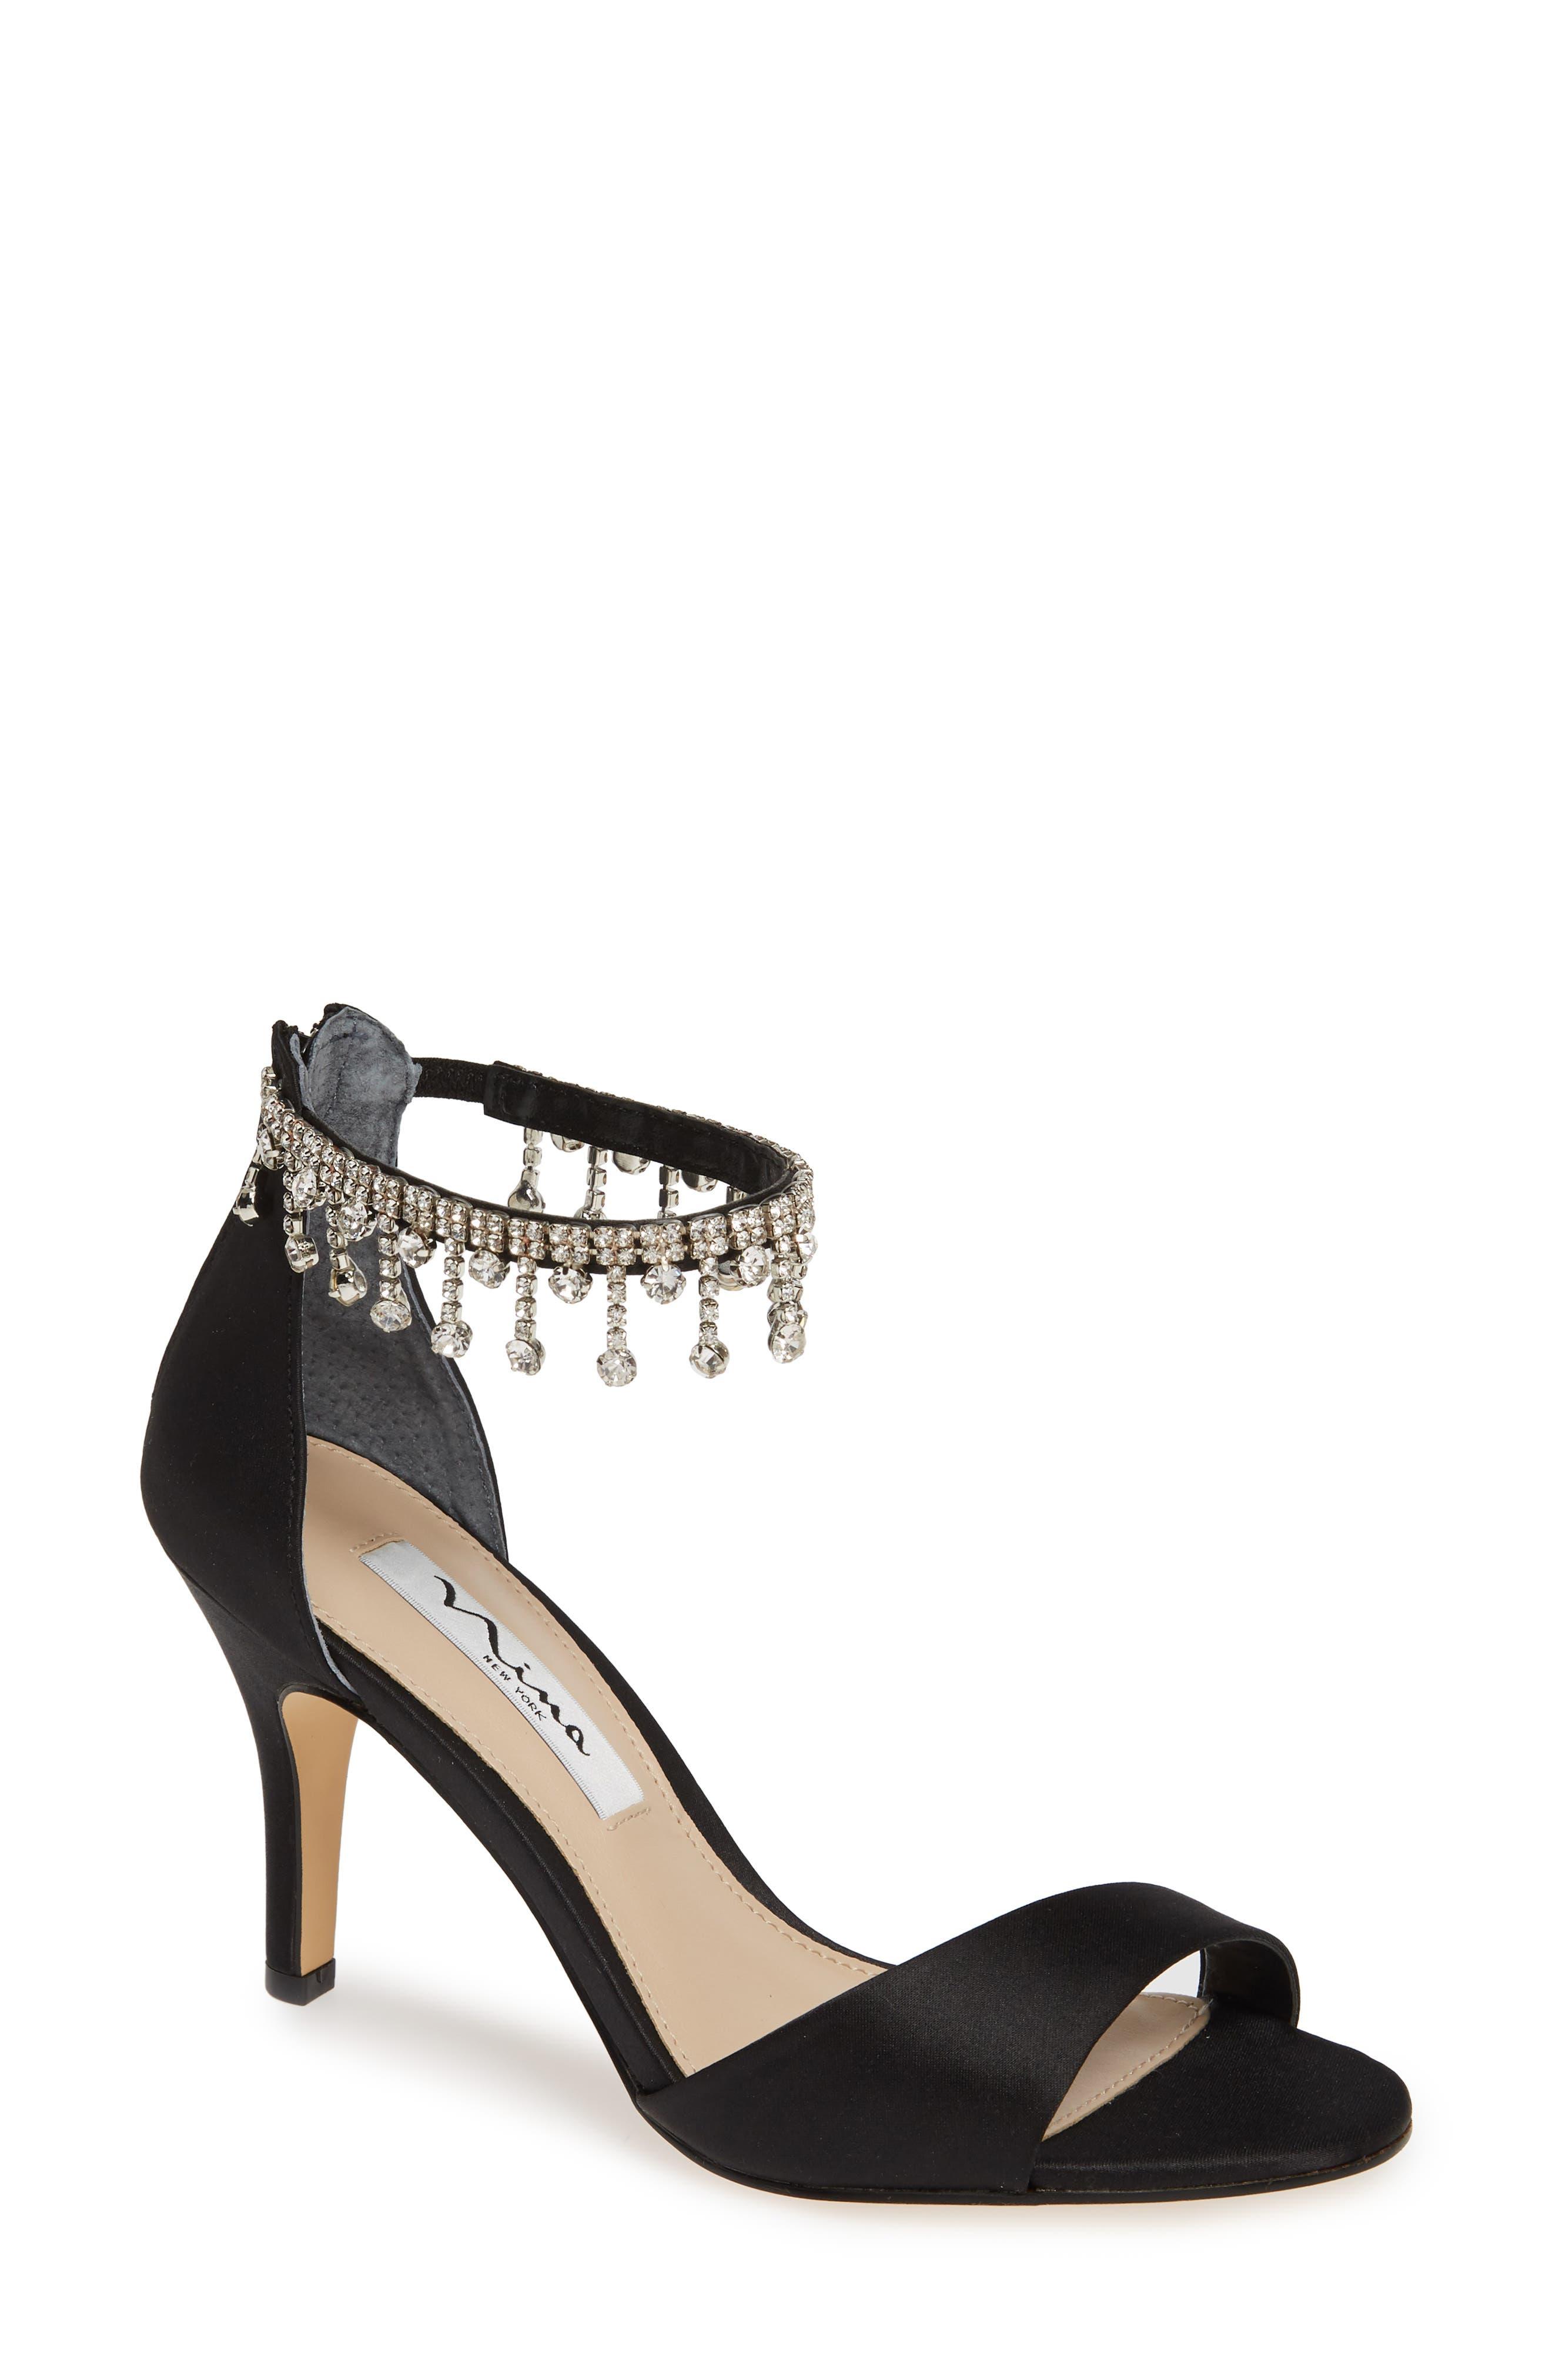 Vera Embellished Ankle Strap Sandal,                             Main thumbnail 1, color,                             BLACK SATIN